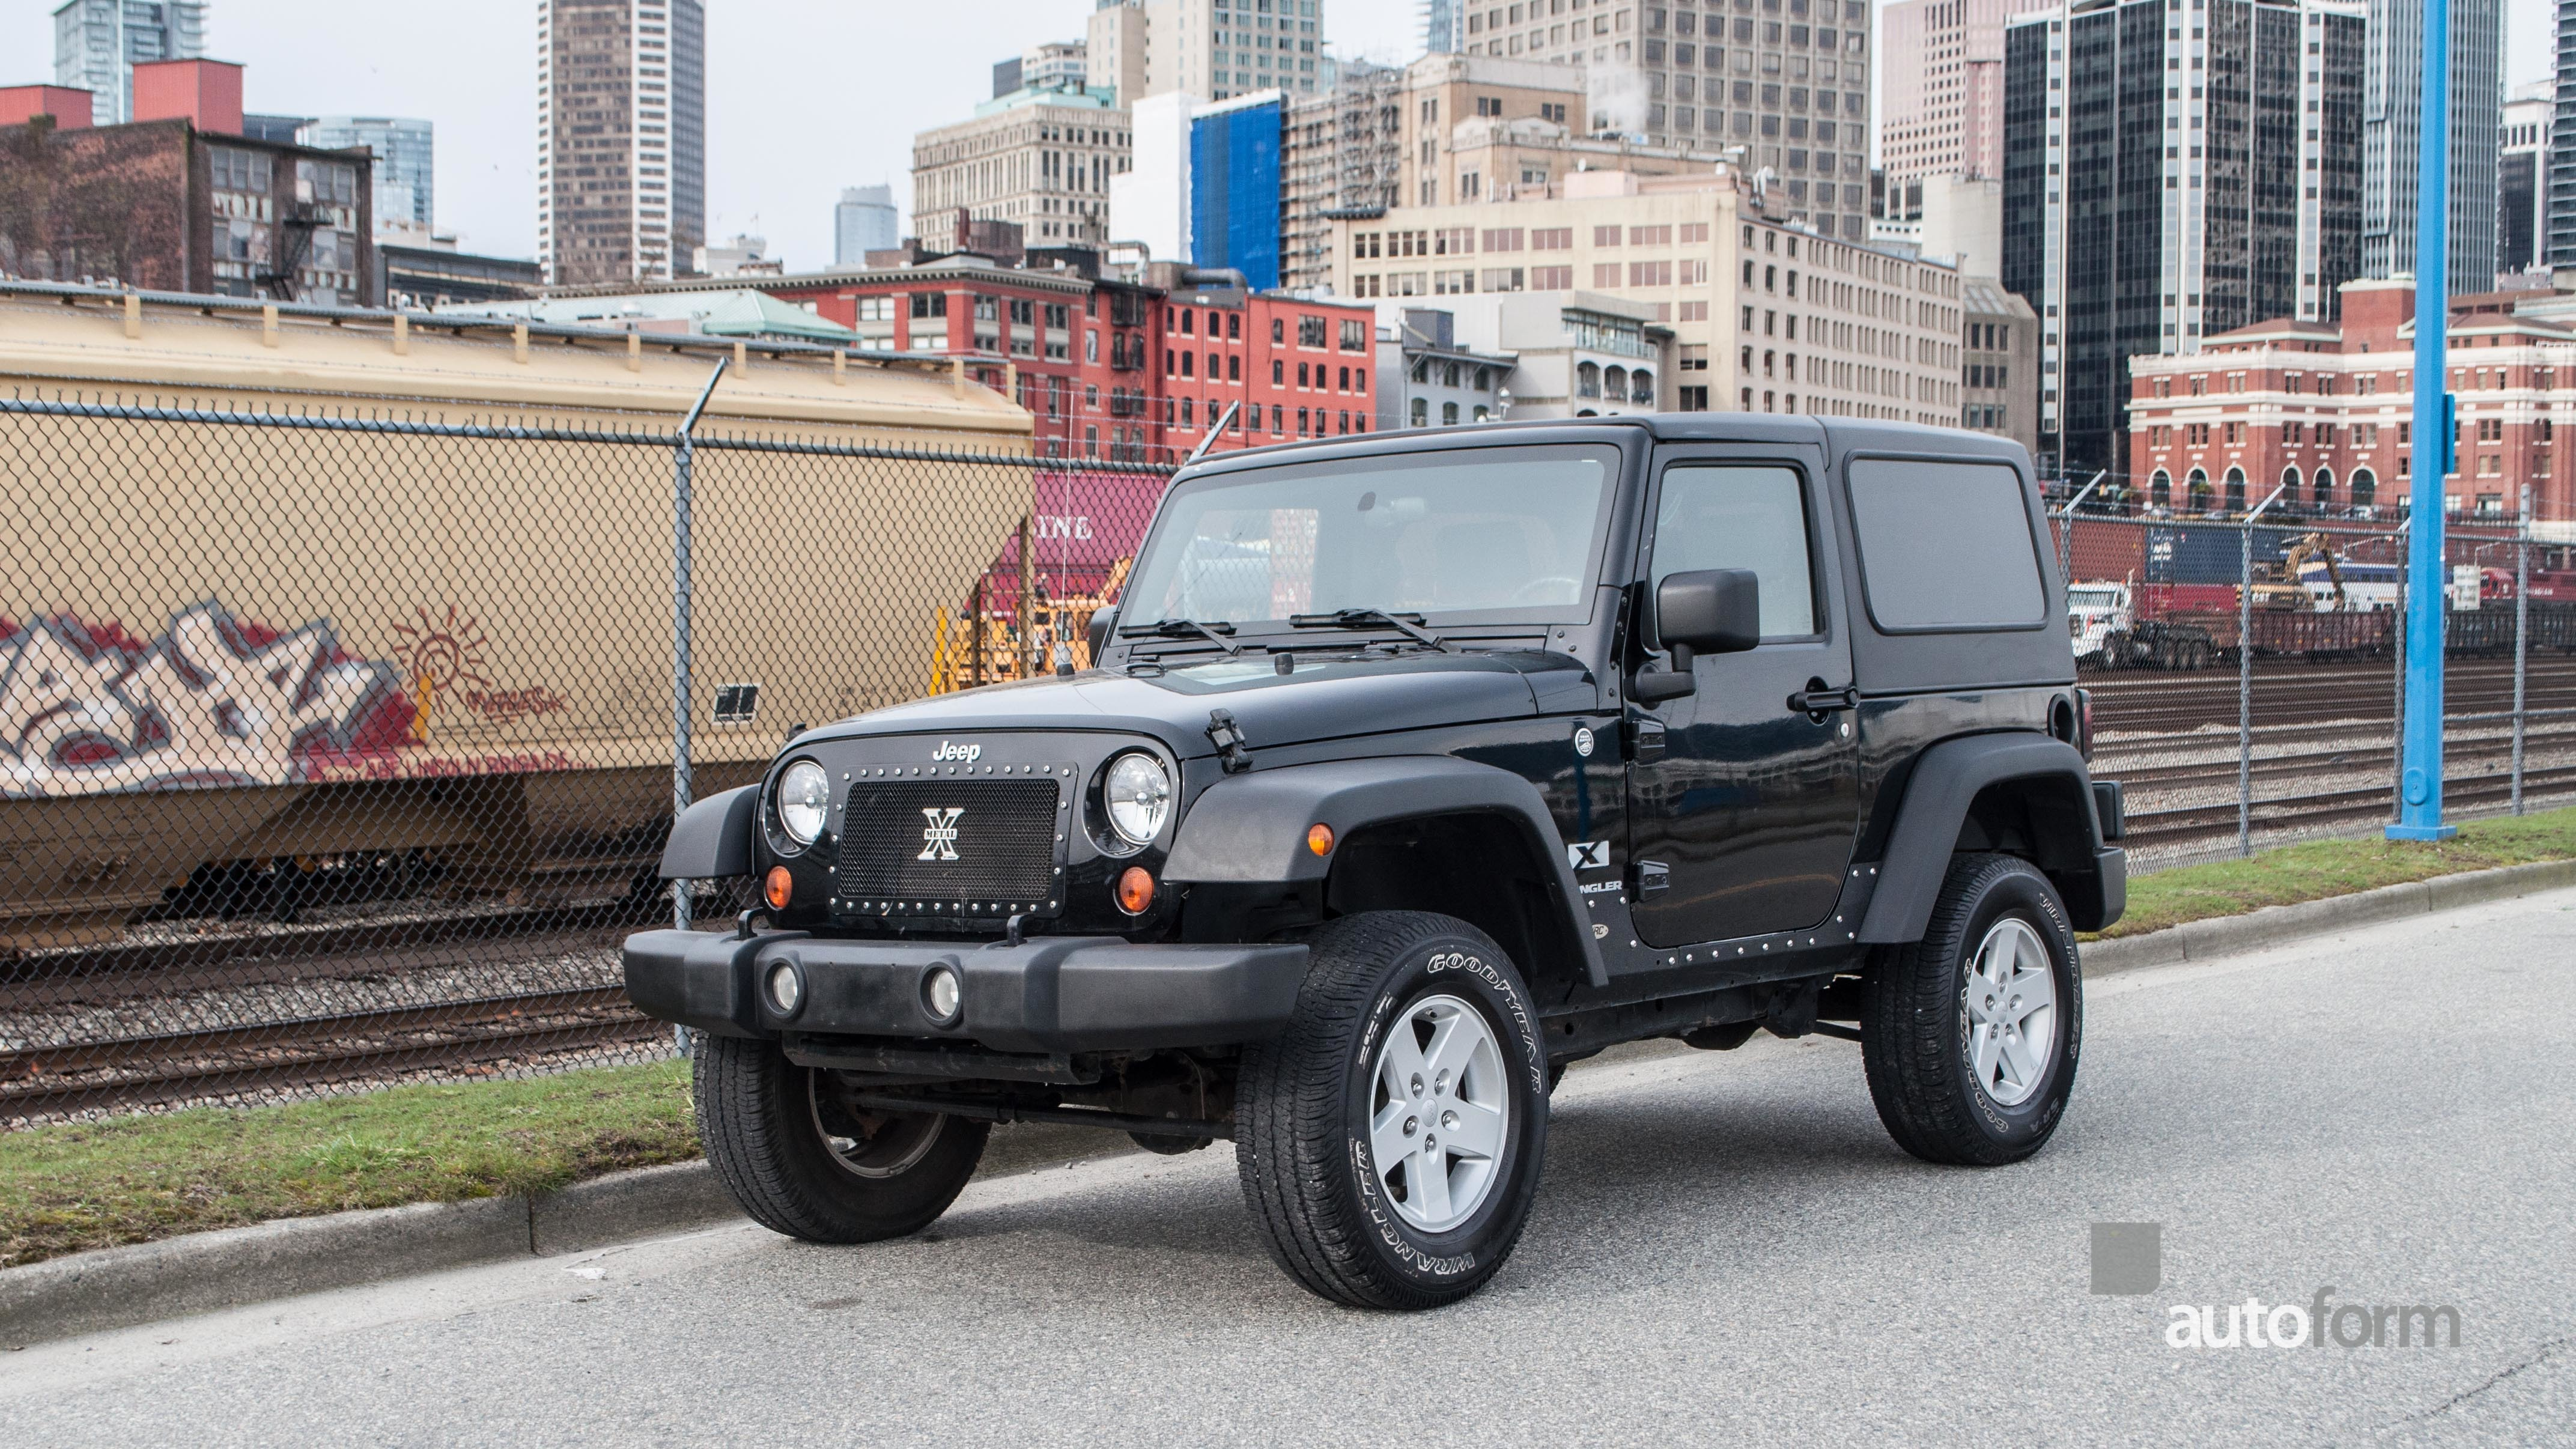 5738 bfaaed08c49d2009 jeep wrangler autoform vancouver2